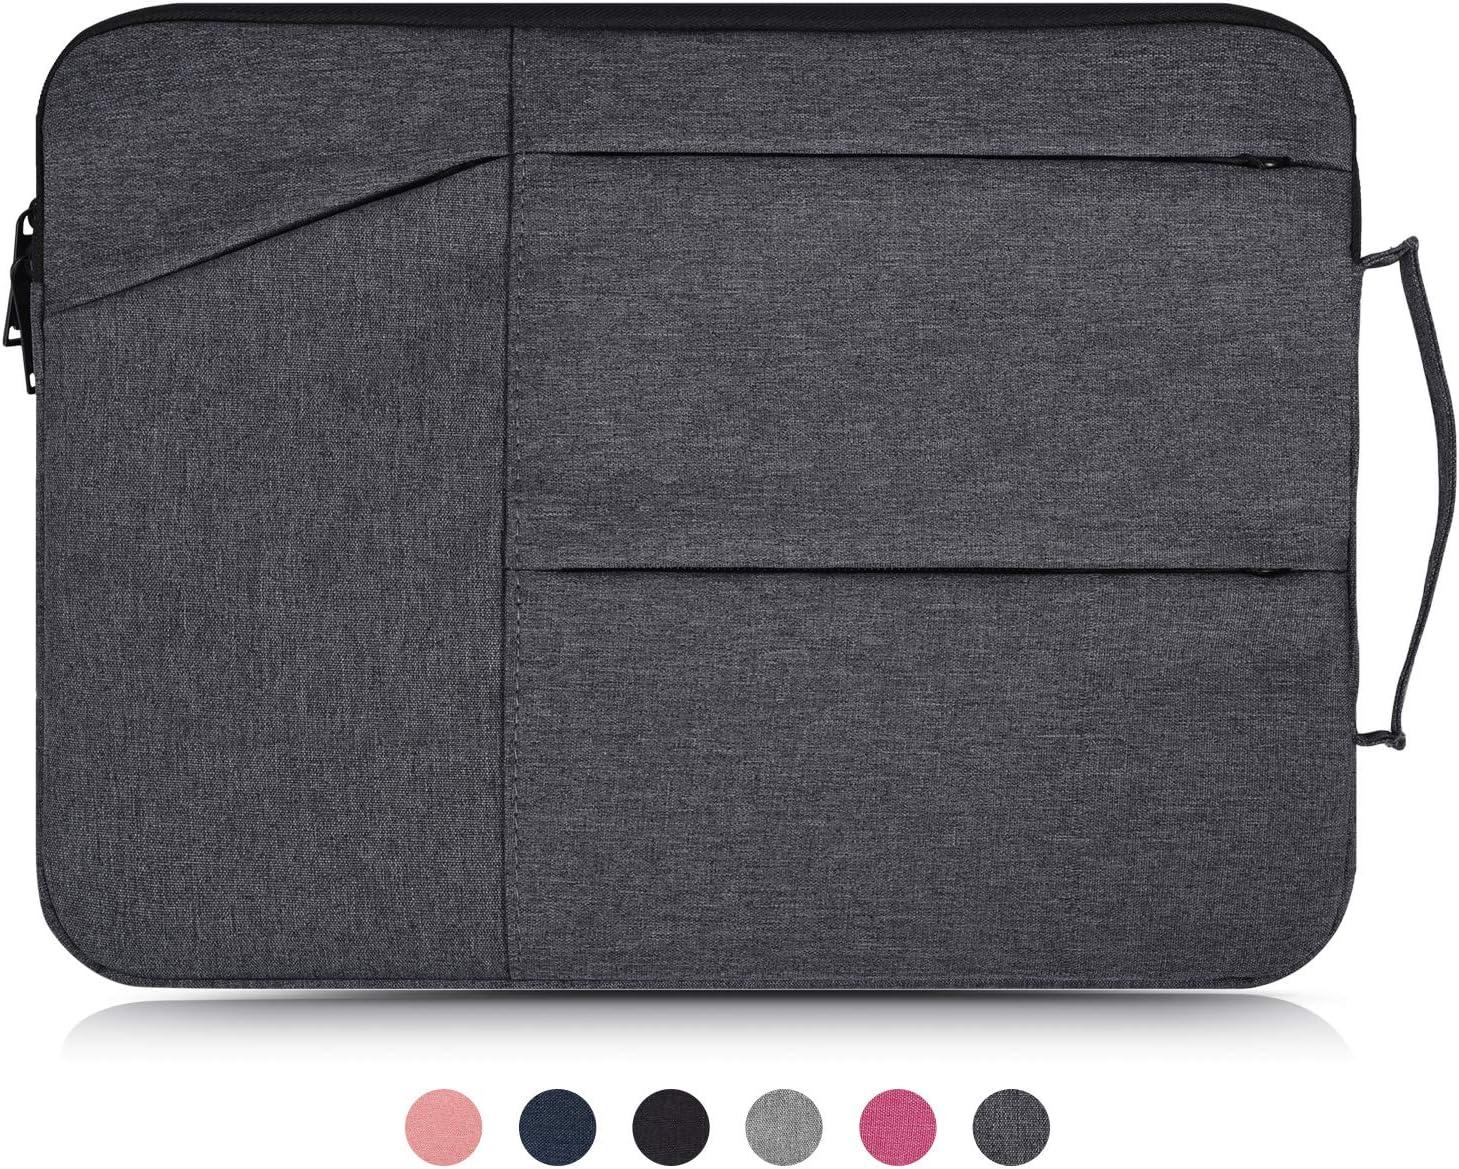 "Dealcase 11.6 Inch Waterproof Laptop Case Compatible Acer chromebook 11.6"",Samsung Chromebook 11.6"",ASUS Chromebook Flip C213SA/ASUS C201 11.6 Inch Chromebook,HP Chromebook 11 Protective Bag,Dark Gray"